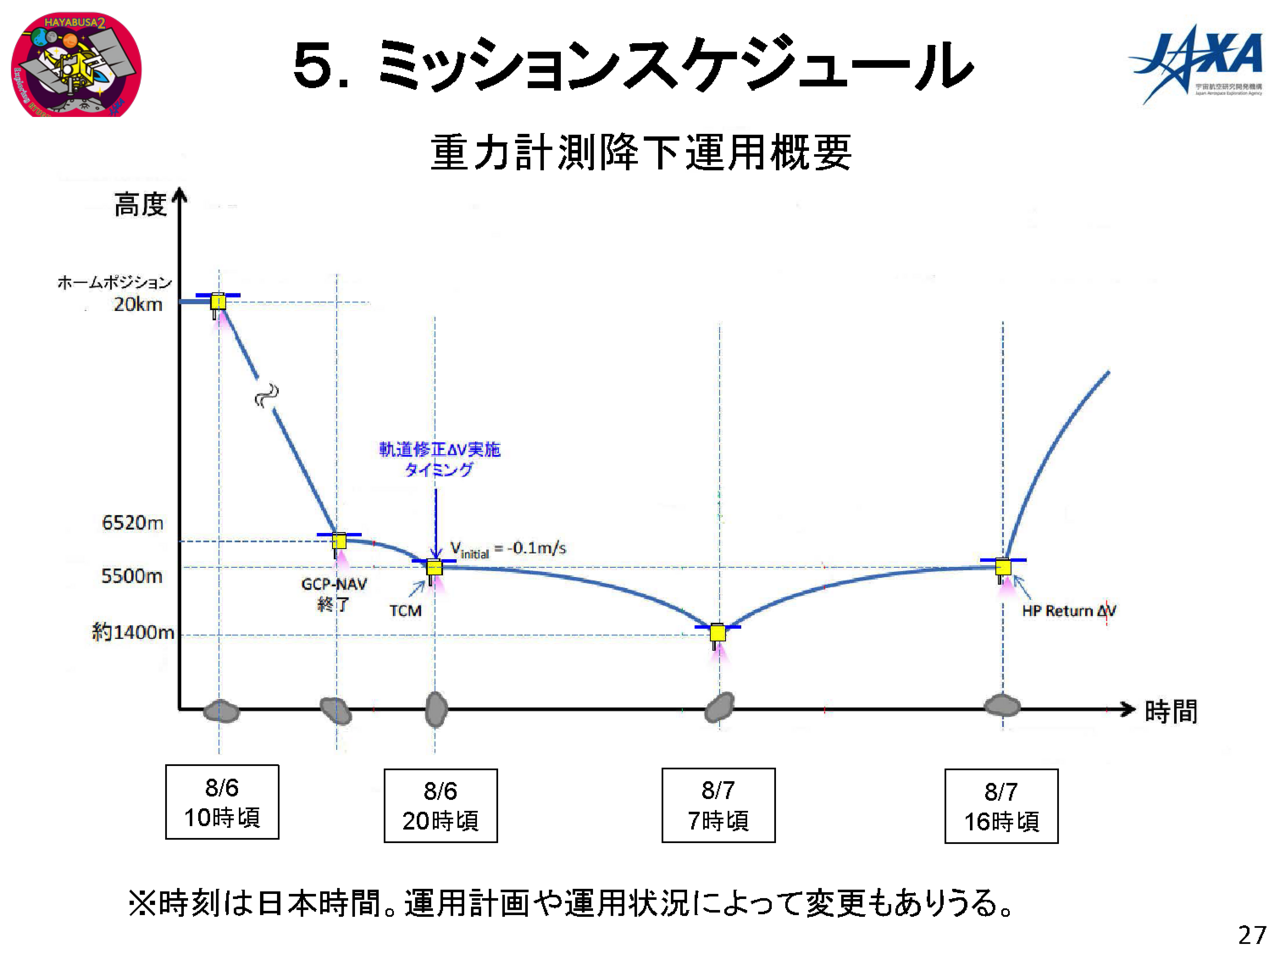 f:id:Imamura:20180802145947p:plain